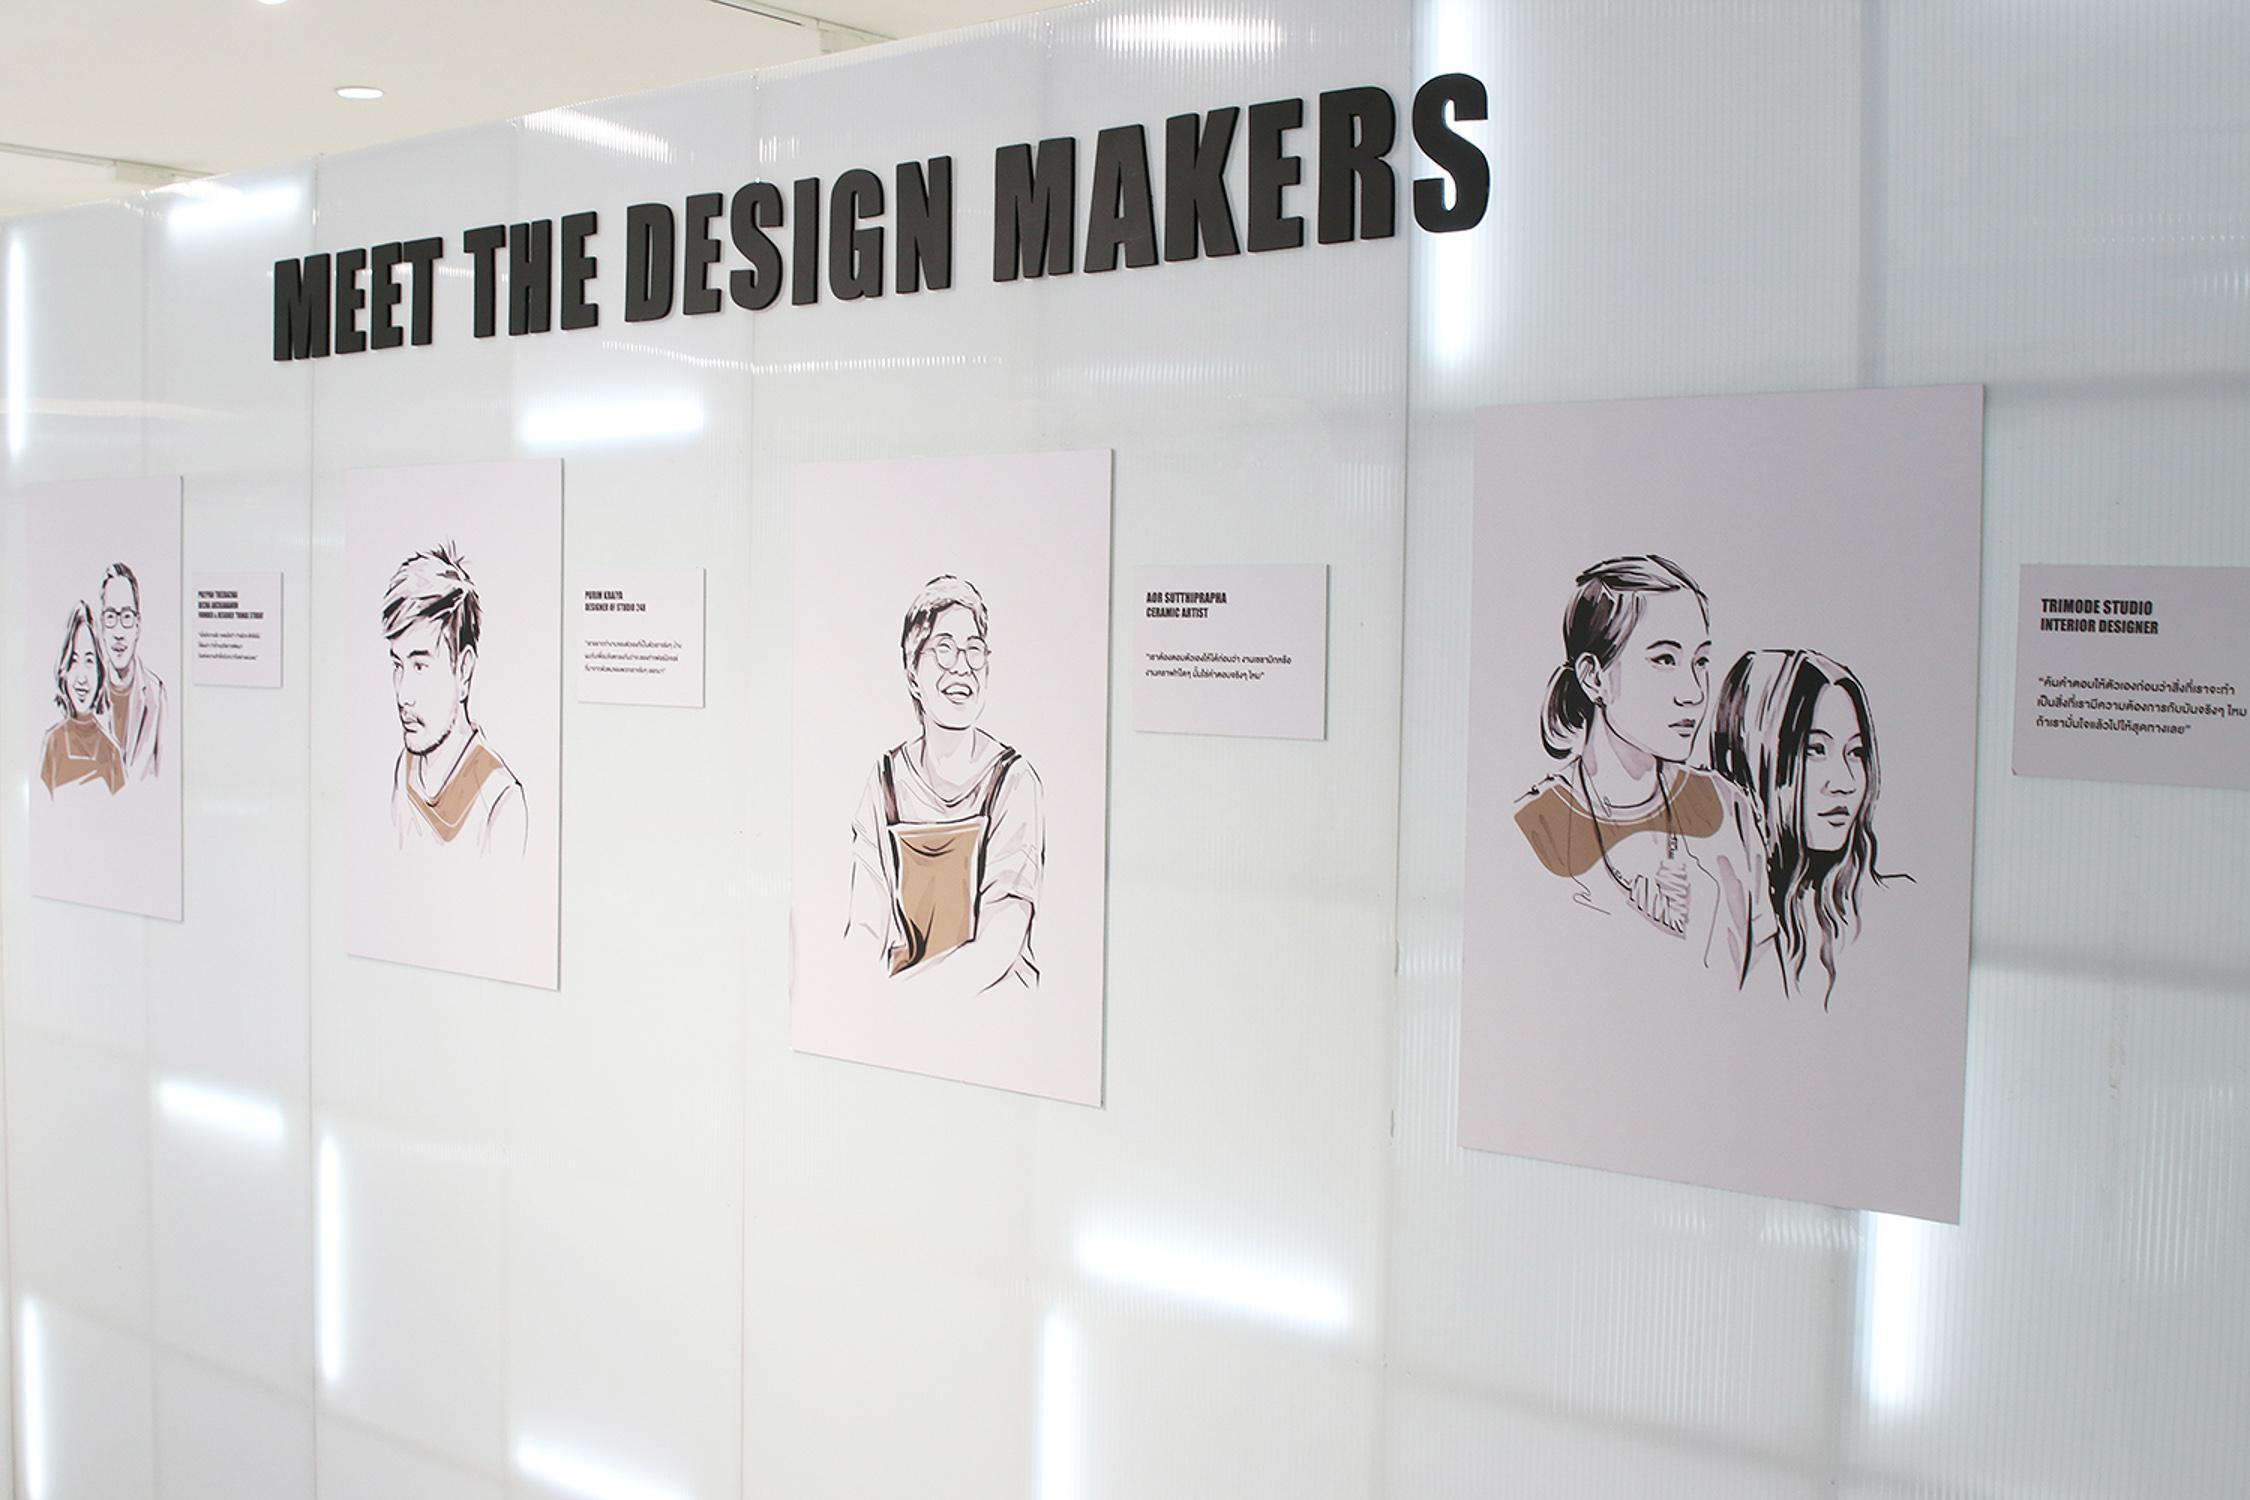 dream makers00026